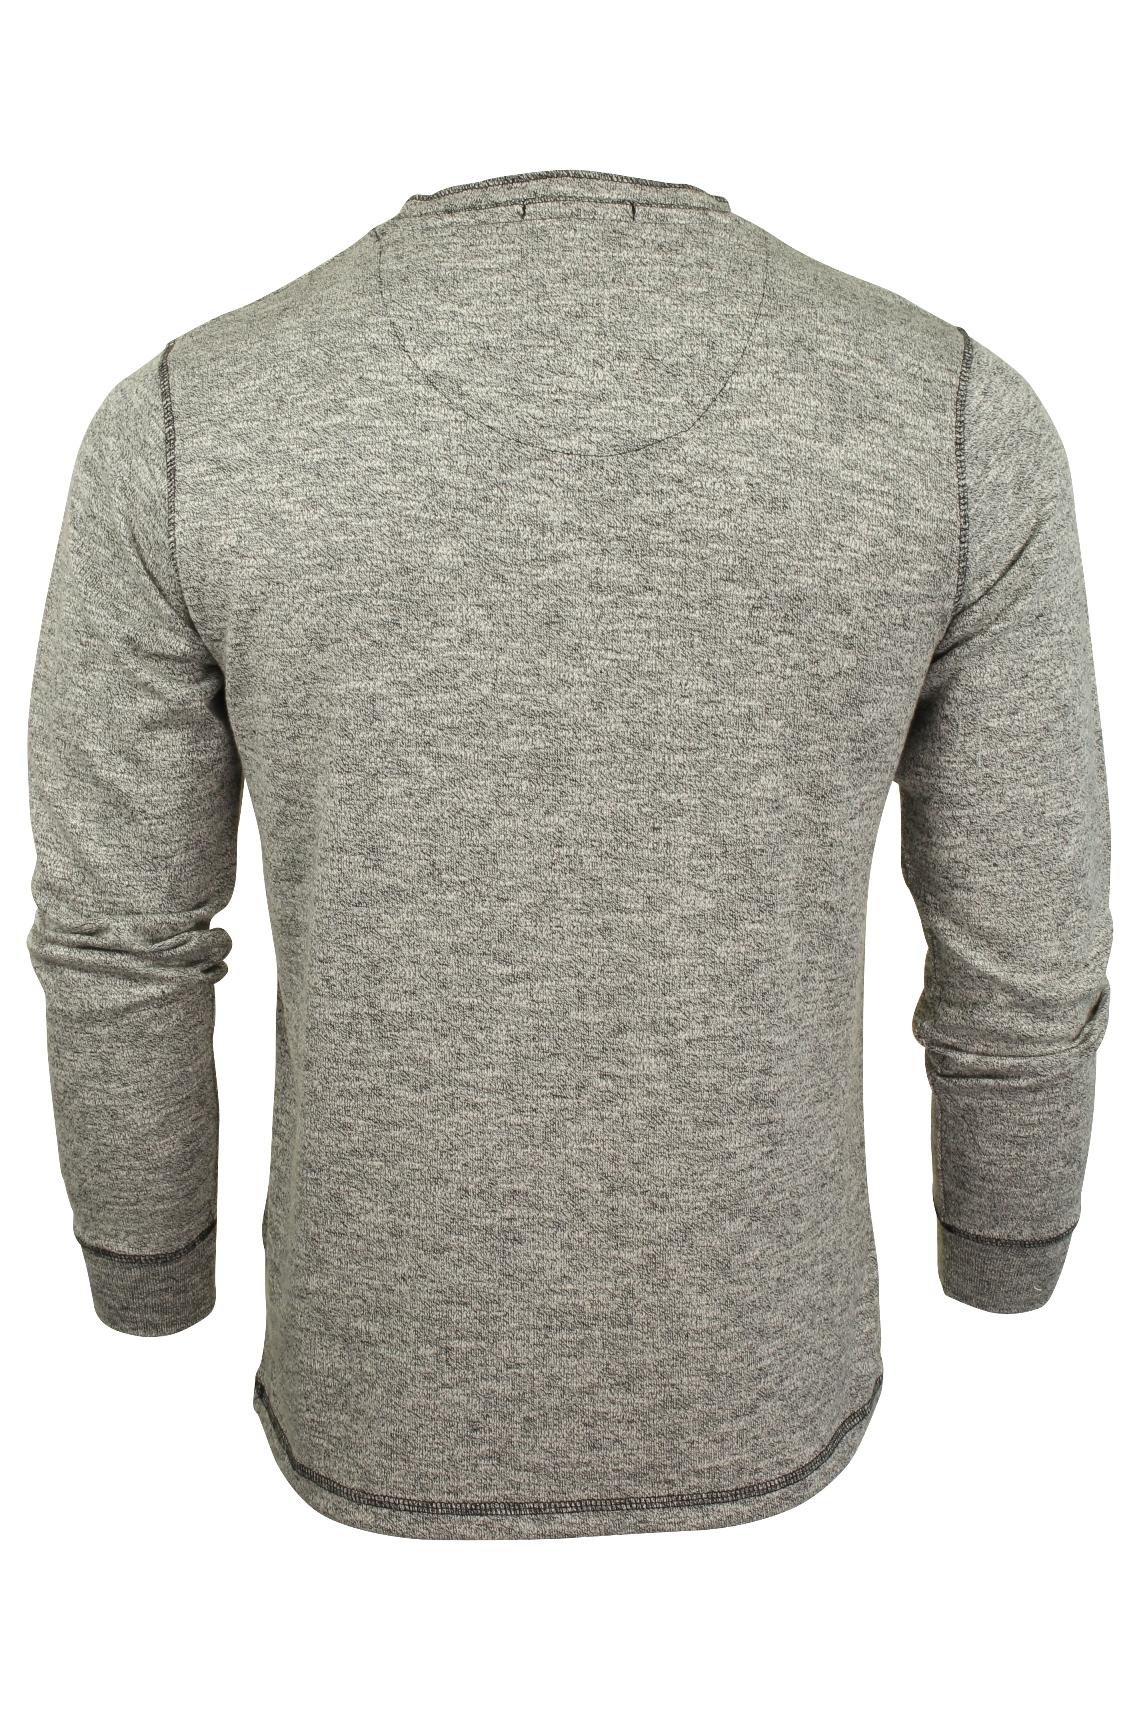 Mens-Long-Sleeve-Grandad-T-Shirt-by-Tokyo-Laundry-039-Roosevelt-039-Siro-Slub-Jersey thumbnail 8